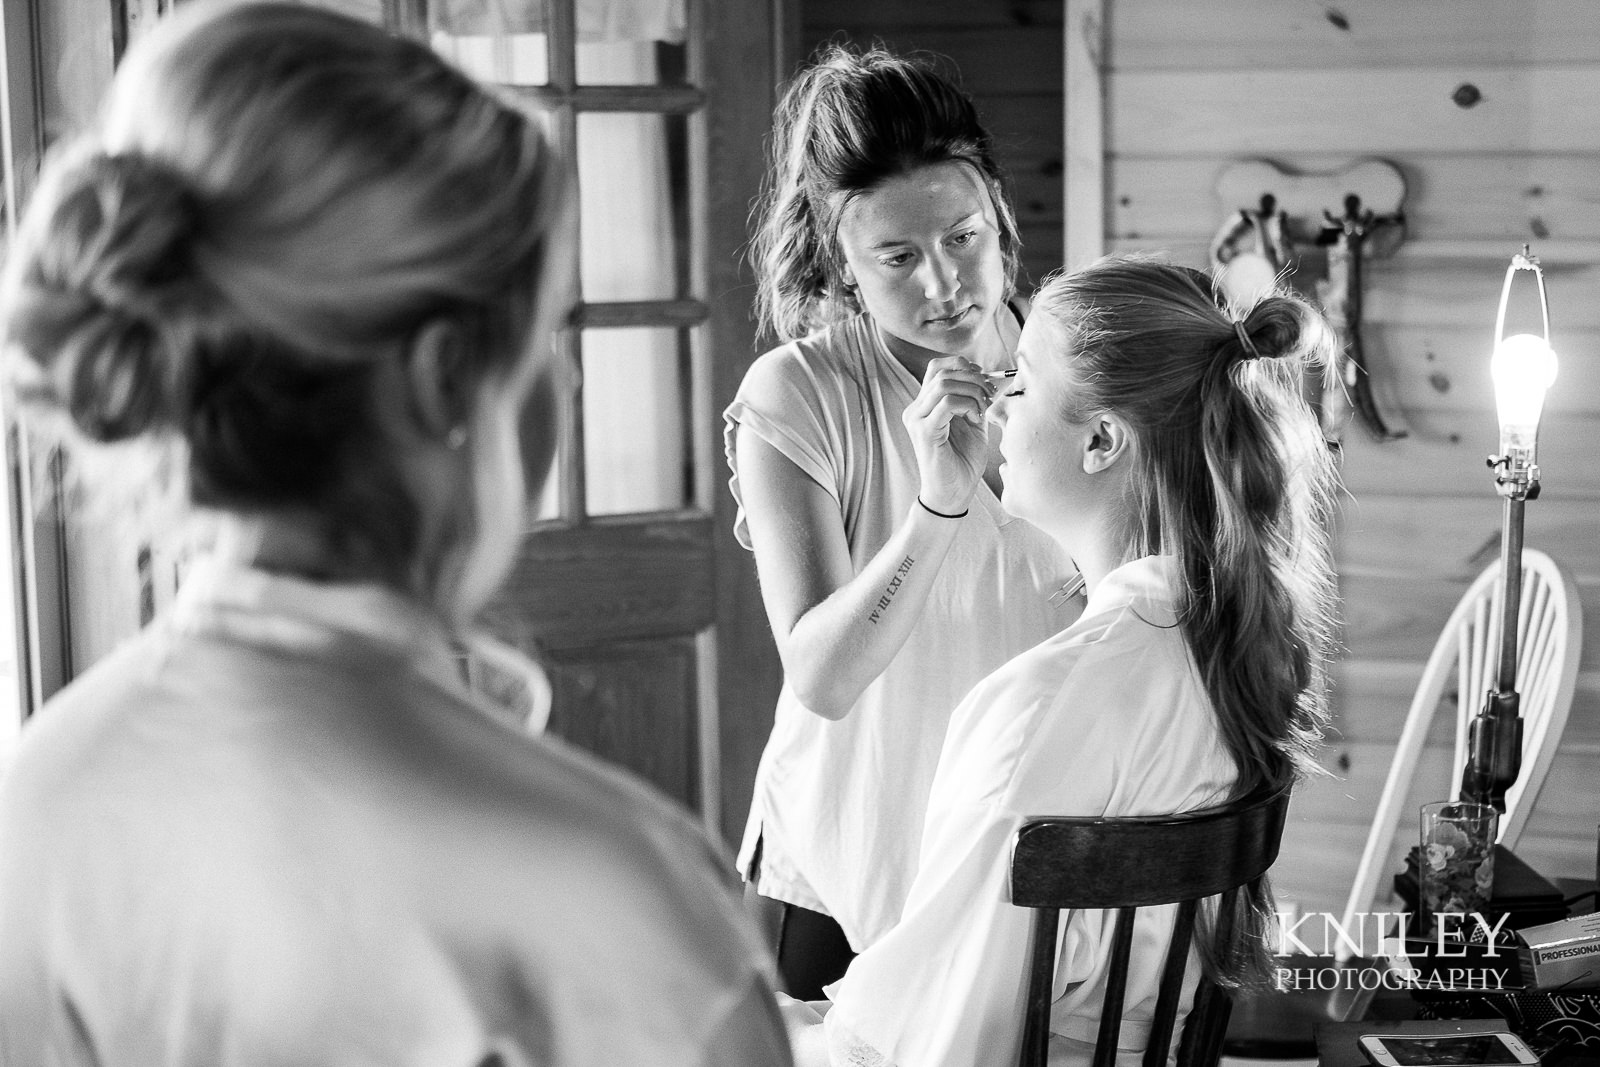 001 - Buffalo NY wedding - Preparation pictures - XT2B8070.jpg